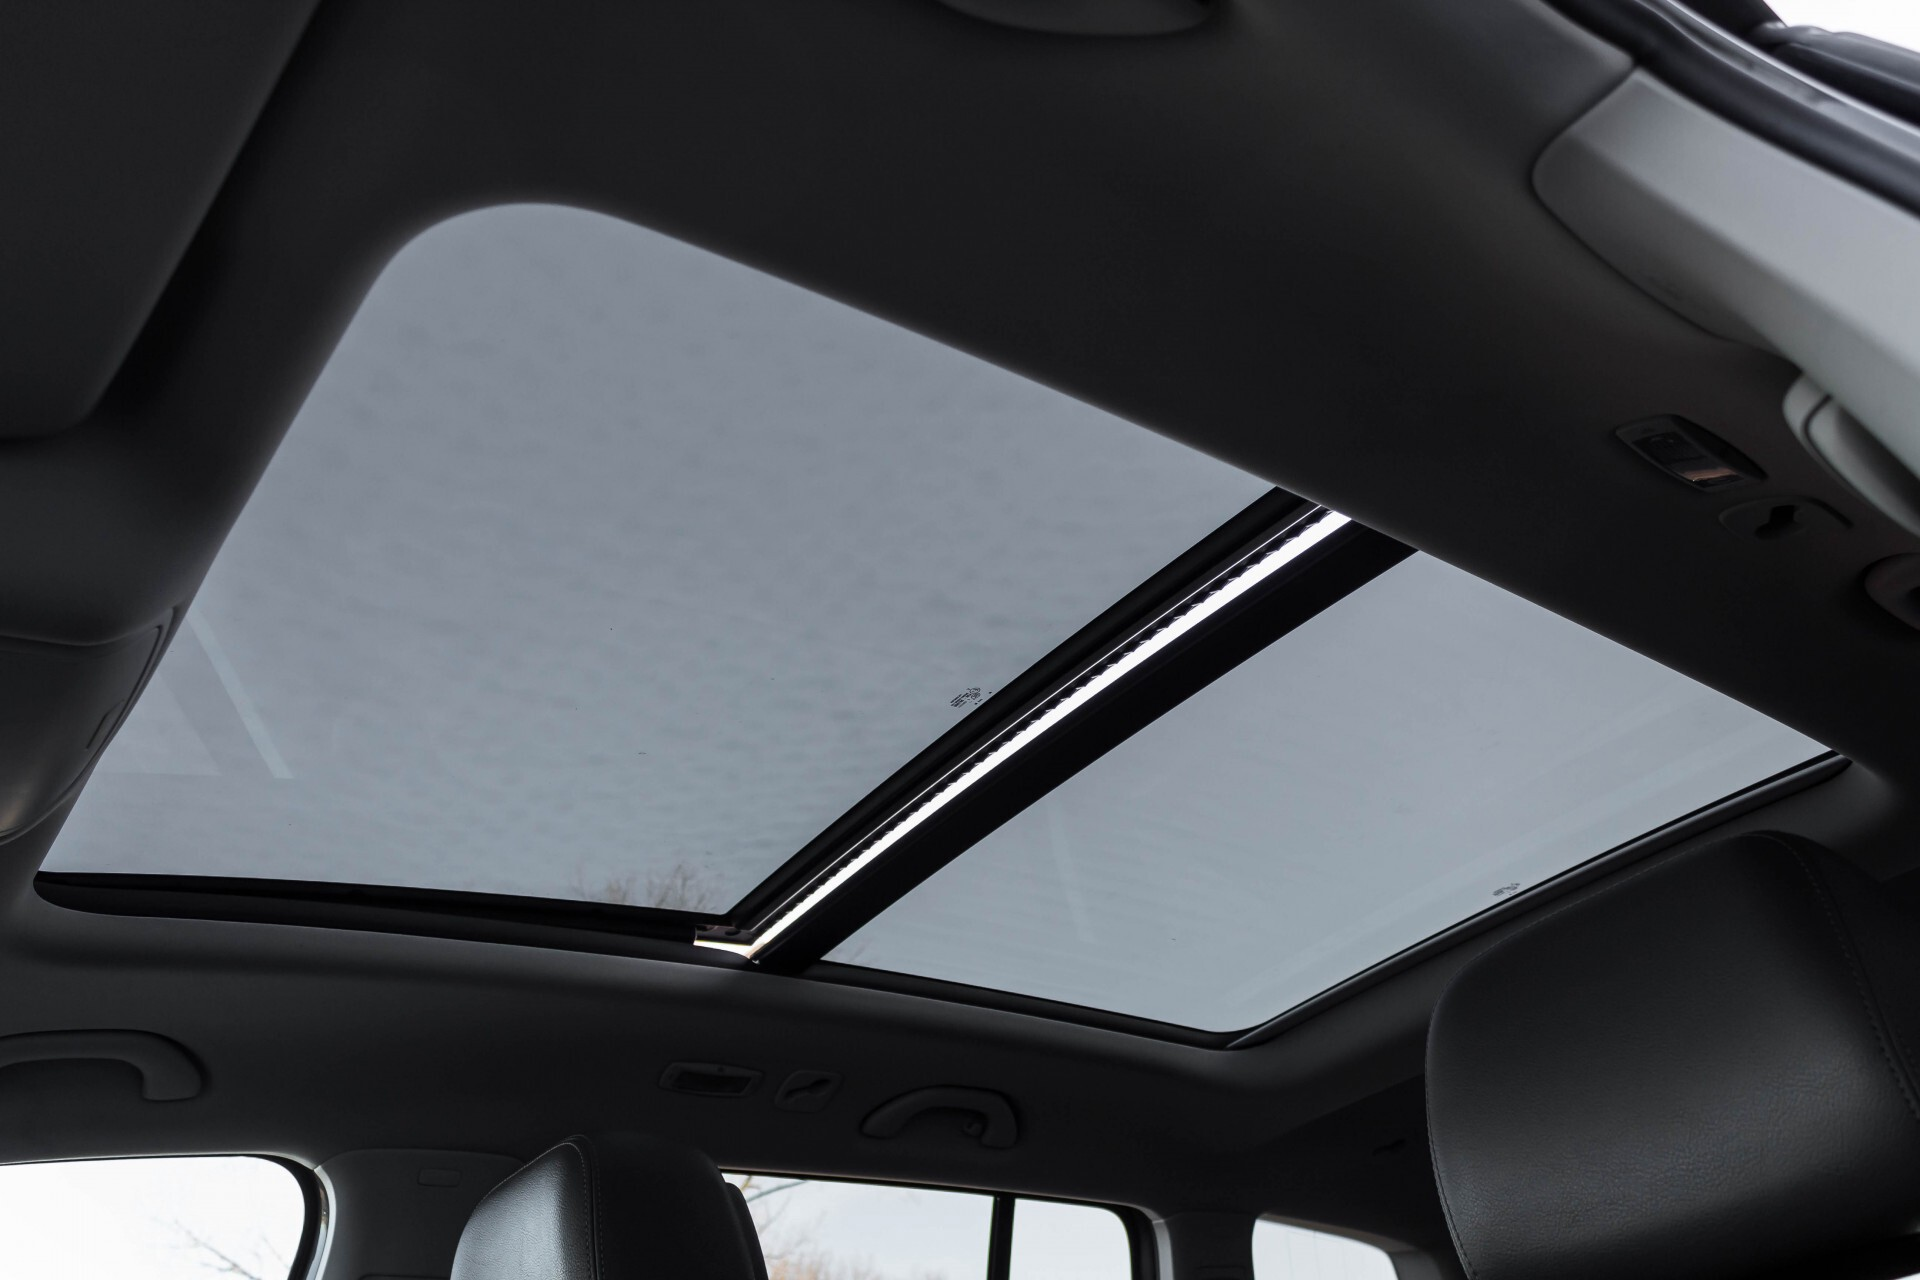 Volkswagen Touran 2.0 TDI Highline 7Persoons 177pk Panorama/Leder/Navi/Camera/Verw-Stln/Trhk/ECC/Xenon Aut Foto 39